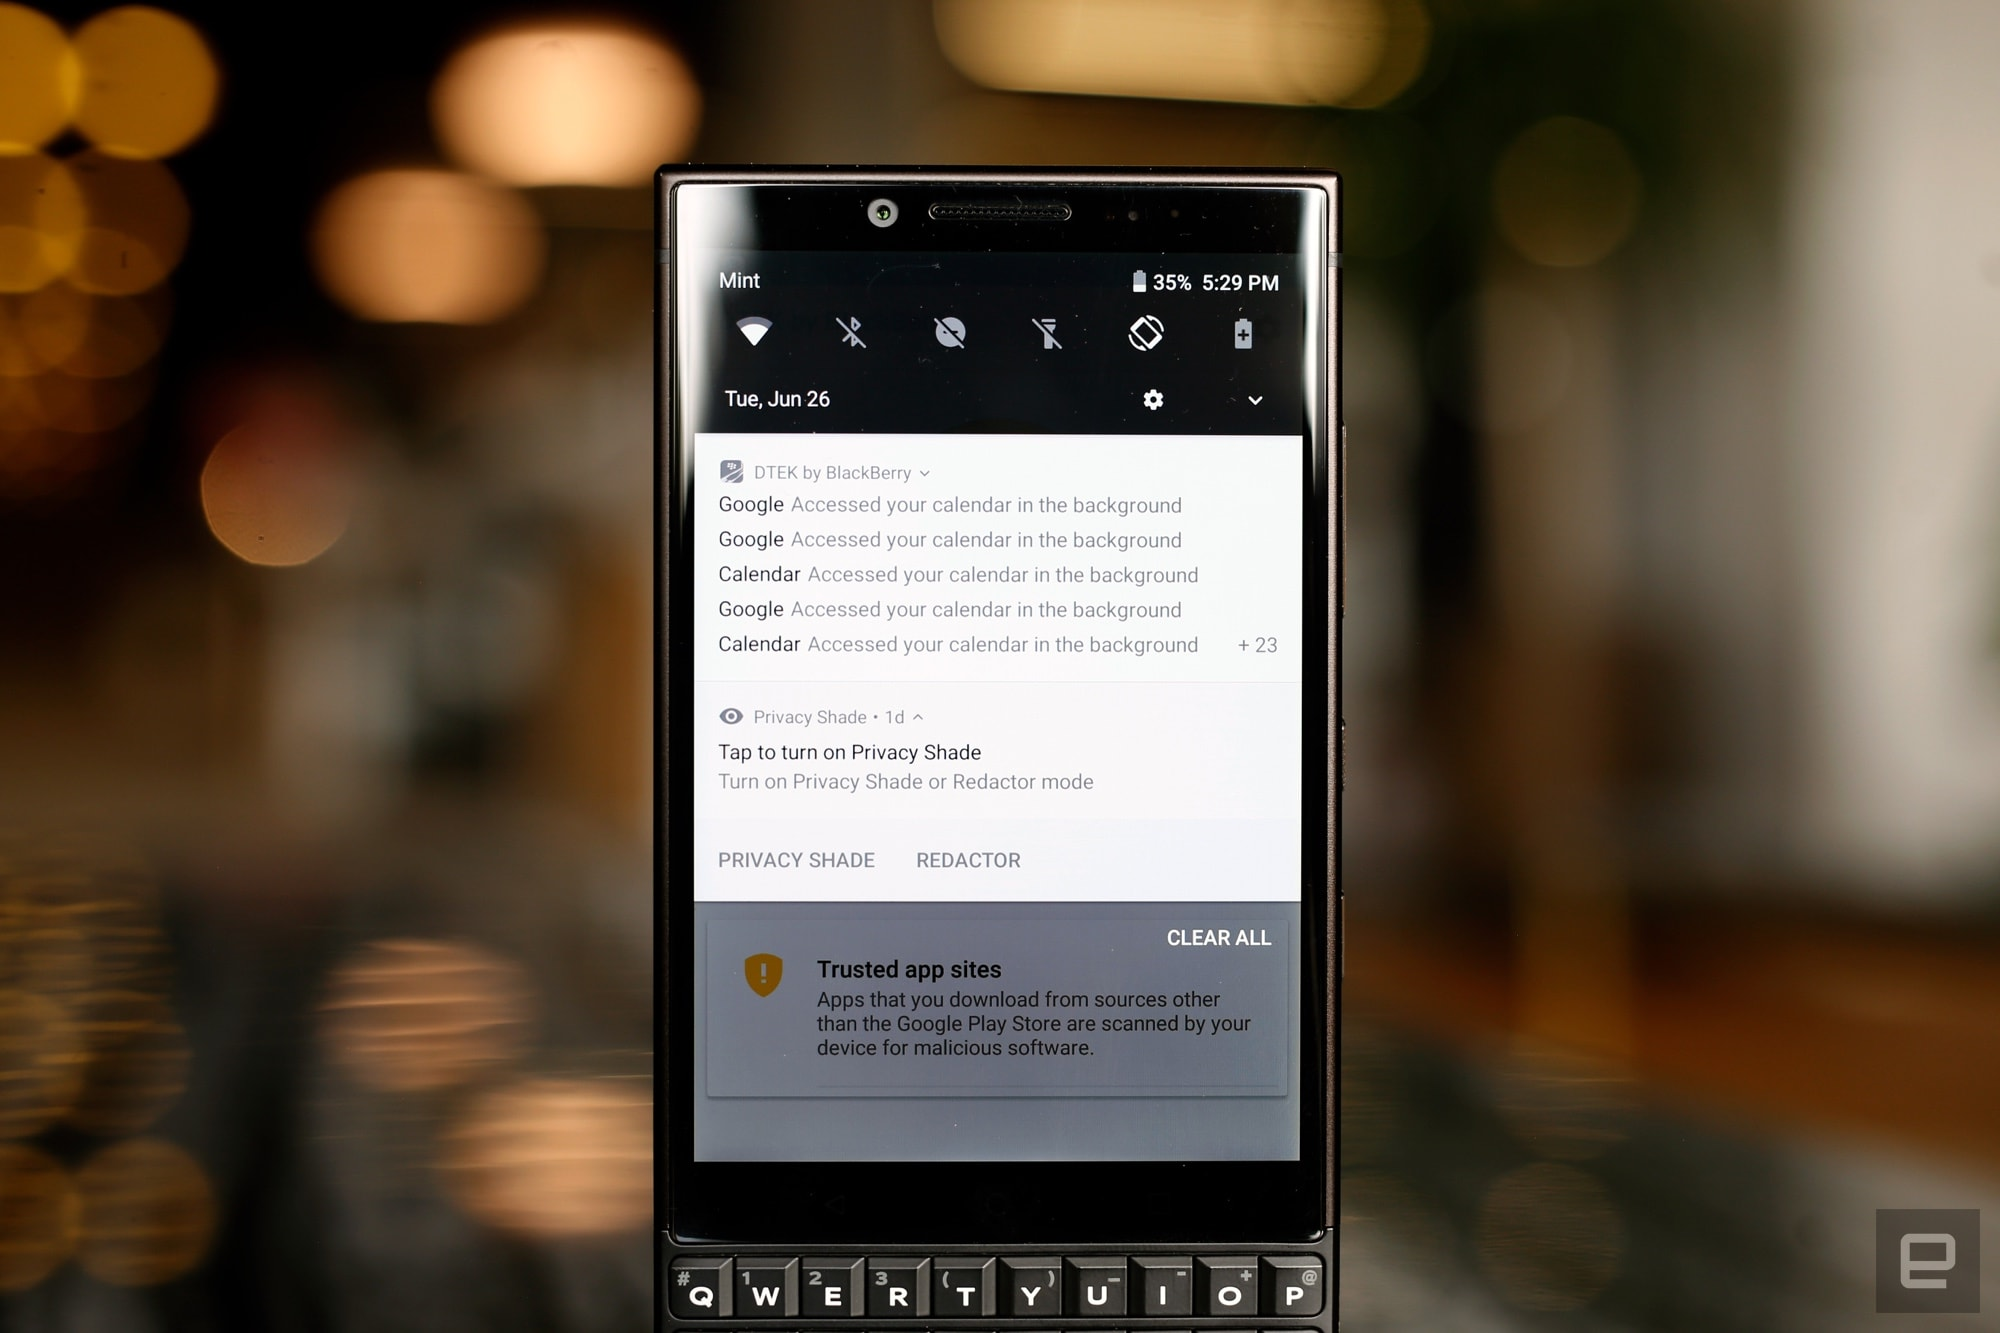 Install Android On Blackberry Passport